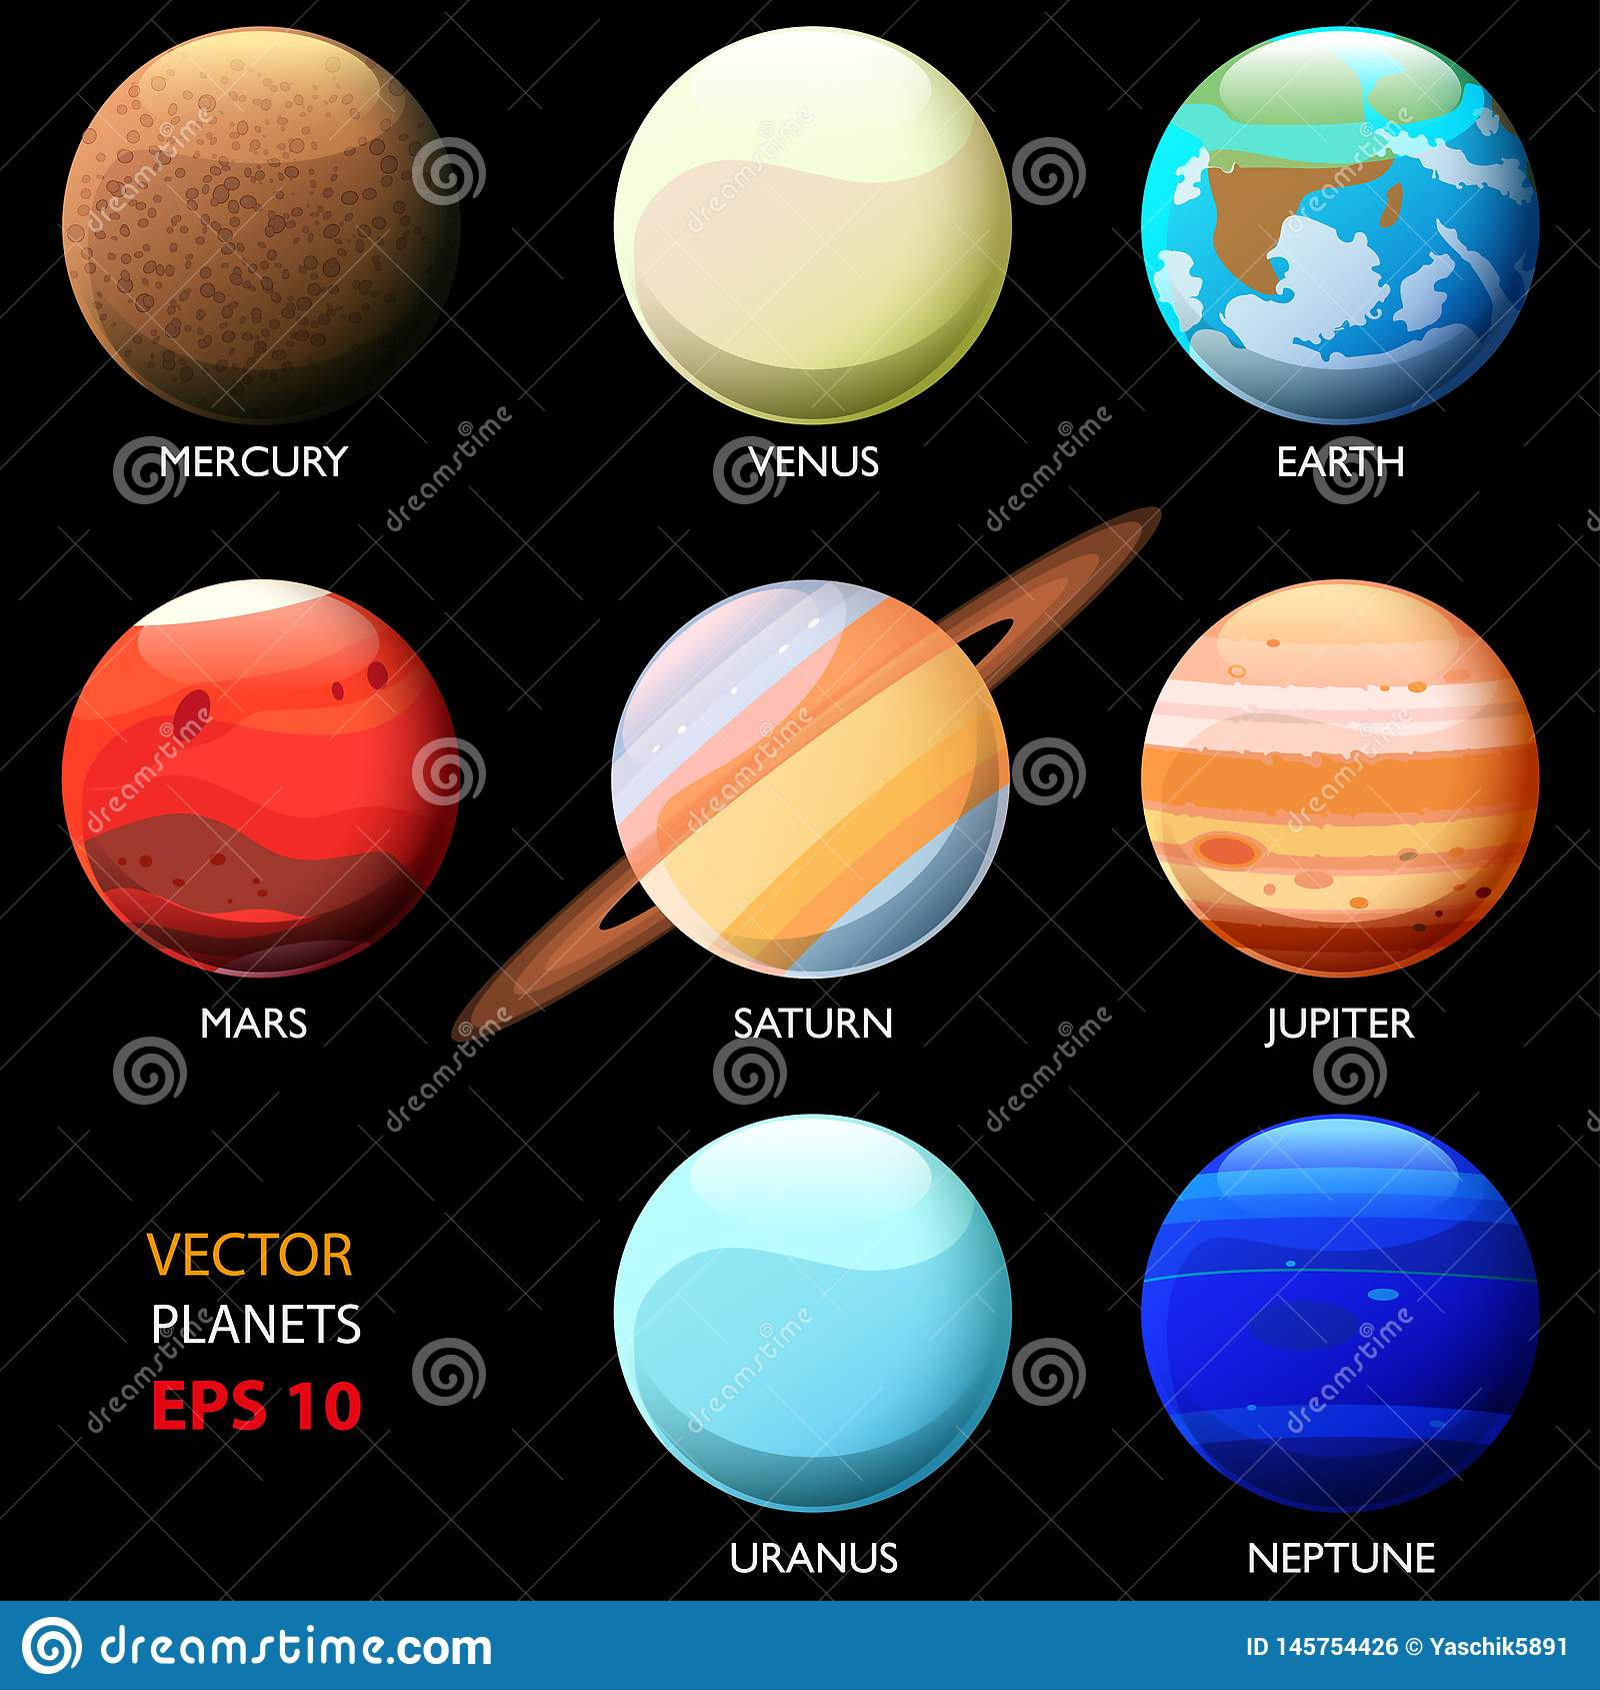 Fije De Ocho Planetas De La Sistema Solar Uranio Y Neptuno De Mercury Venus Earth Mars Jupiter Saturn Estilo De La Historieta Ilustración Del Vector Ilustración De Uranio Mundo 145754426